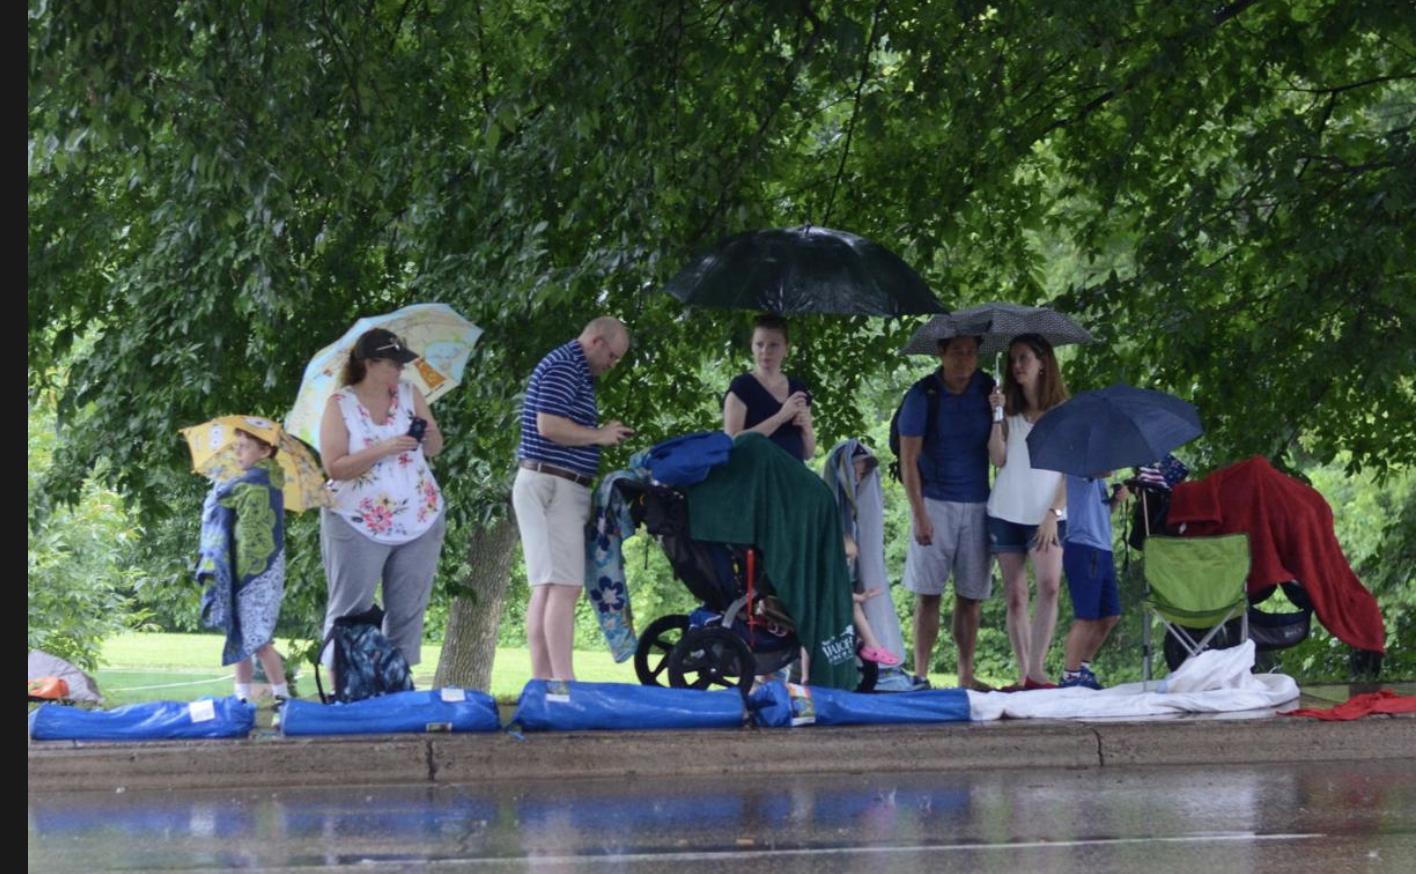 Photos: Edina's Fourth of July Parade Overcomes Threat of Rain   Edina Sun Current , July 5, 2018